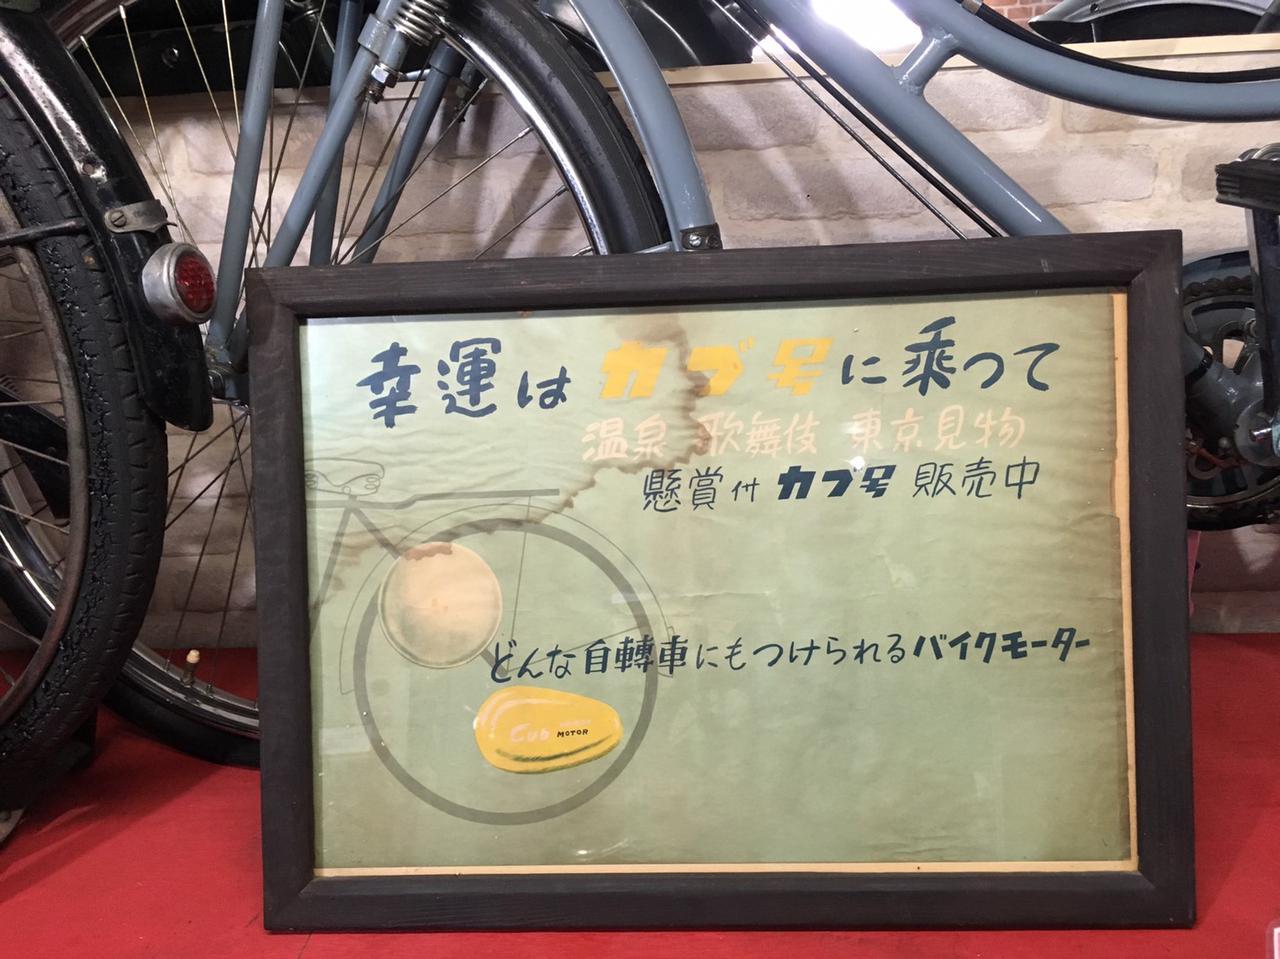 Images : 31番目の画像 - 福山理子が撮影した岩下コレクションの写真 - webオートバイ